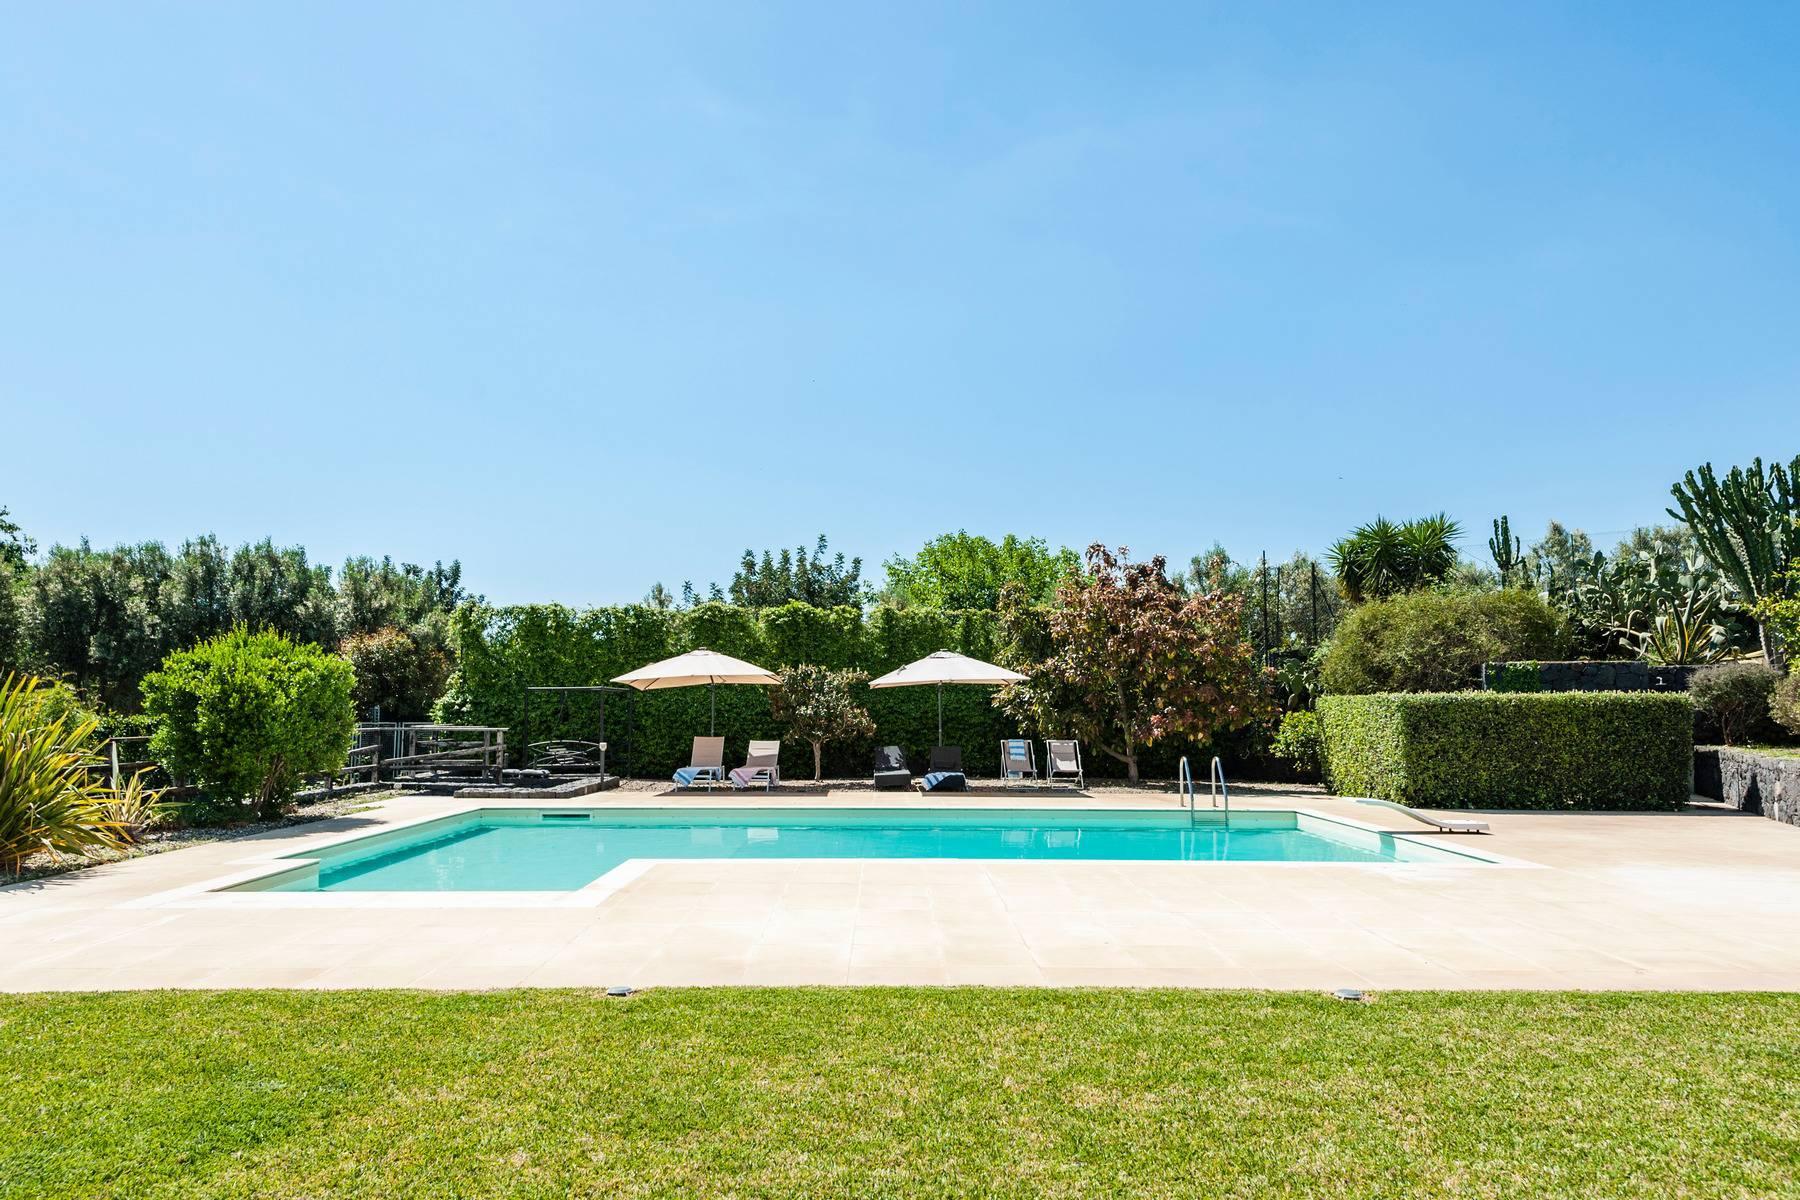 Villa esclusiva con piscina con vista ad Acireale - 1